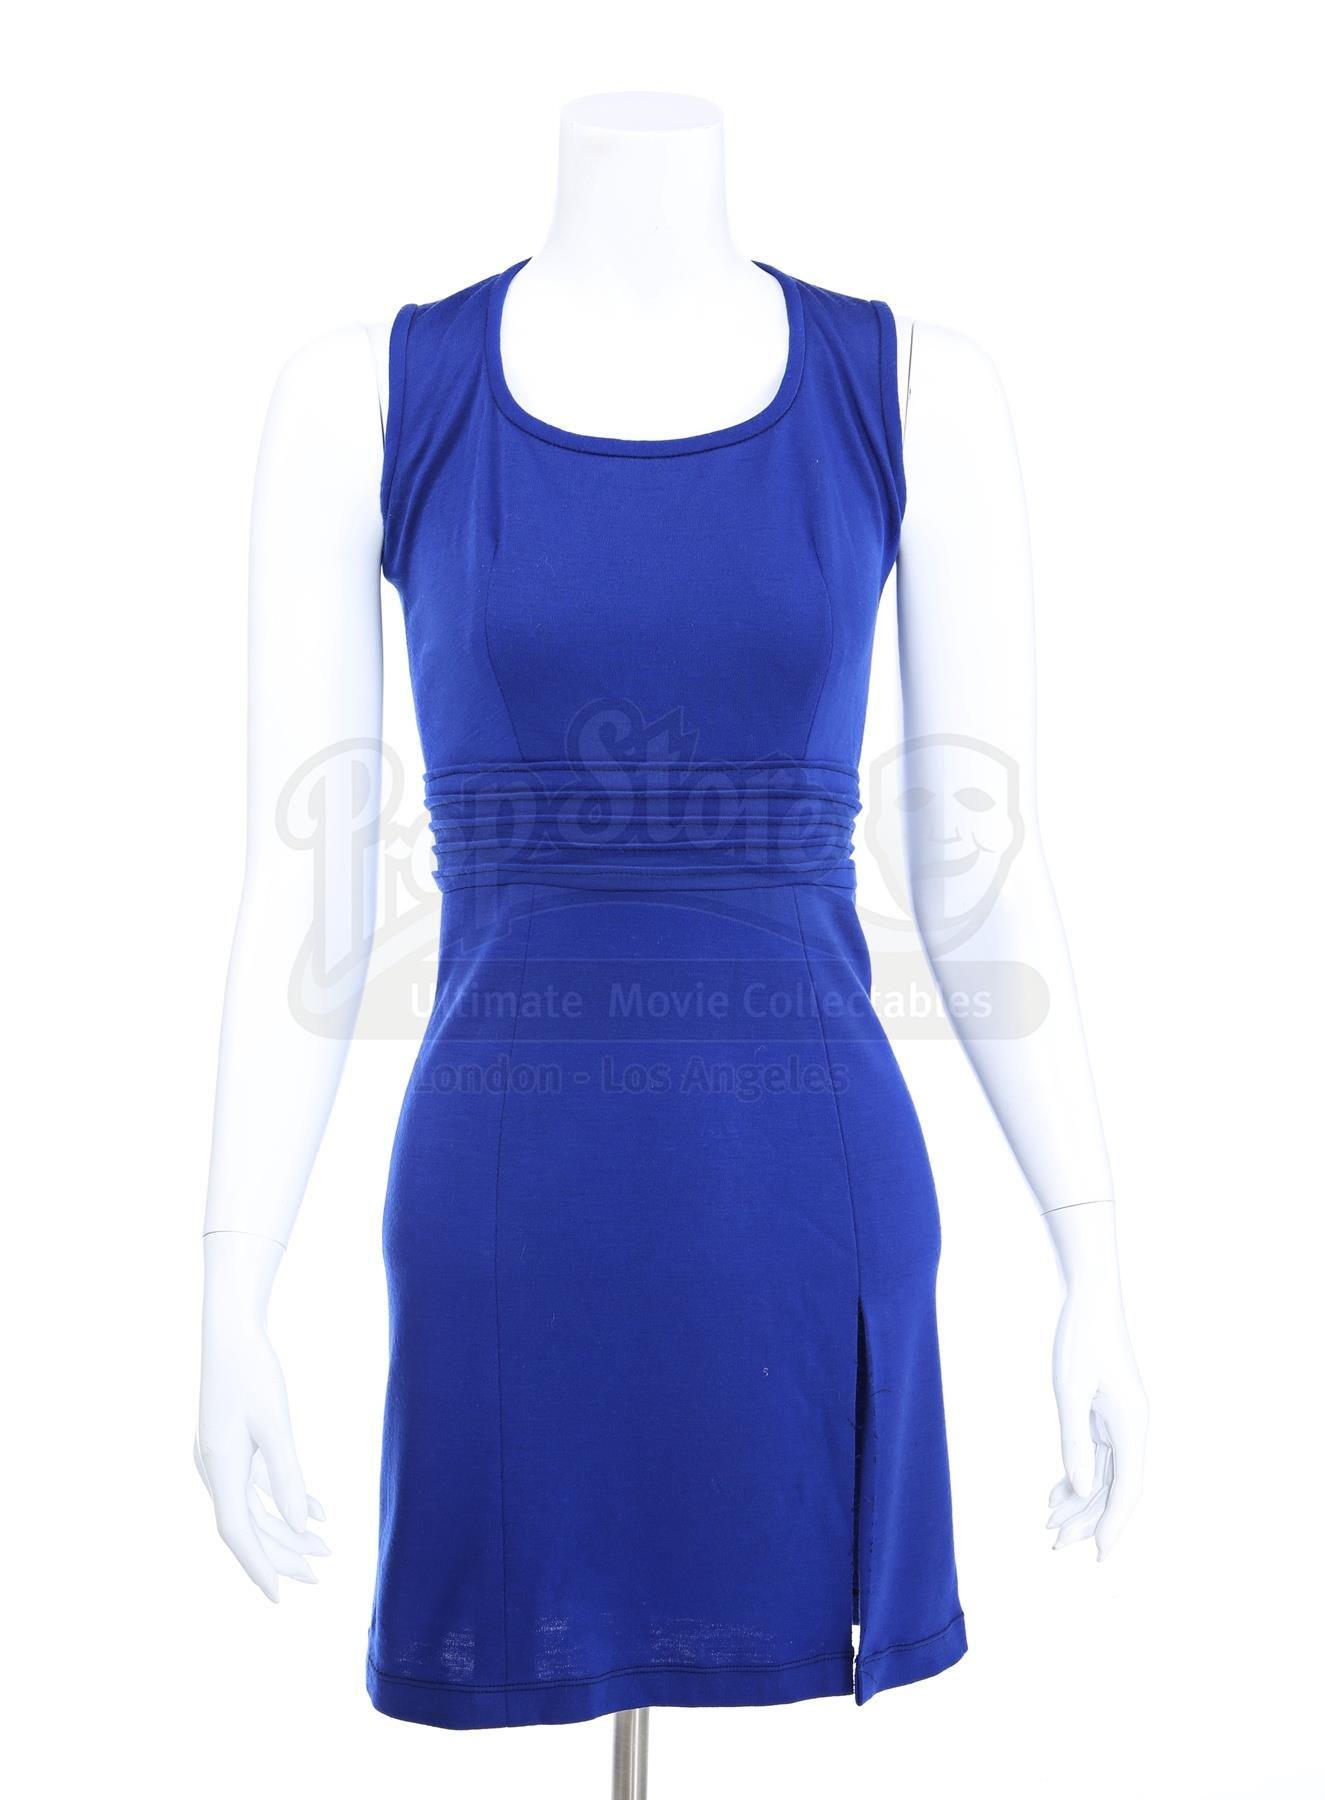 The Twilight Saga Breaking Dawn Part 2 2012 Bella Cullens Blue Transformation Dress Current Price 3200 Dress Twilight Dresses Vampire Dress [ 1800 x 1325 Pixel ]